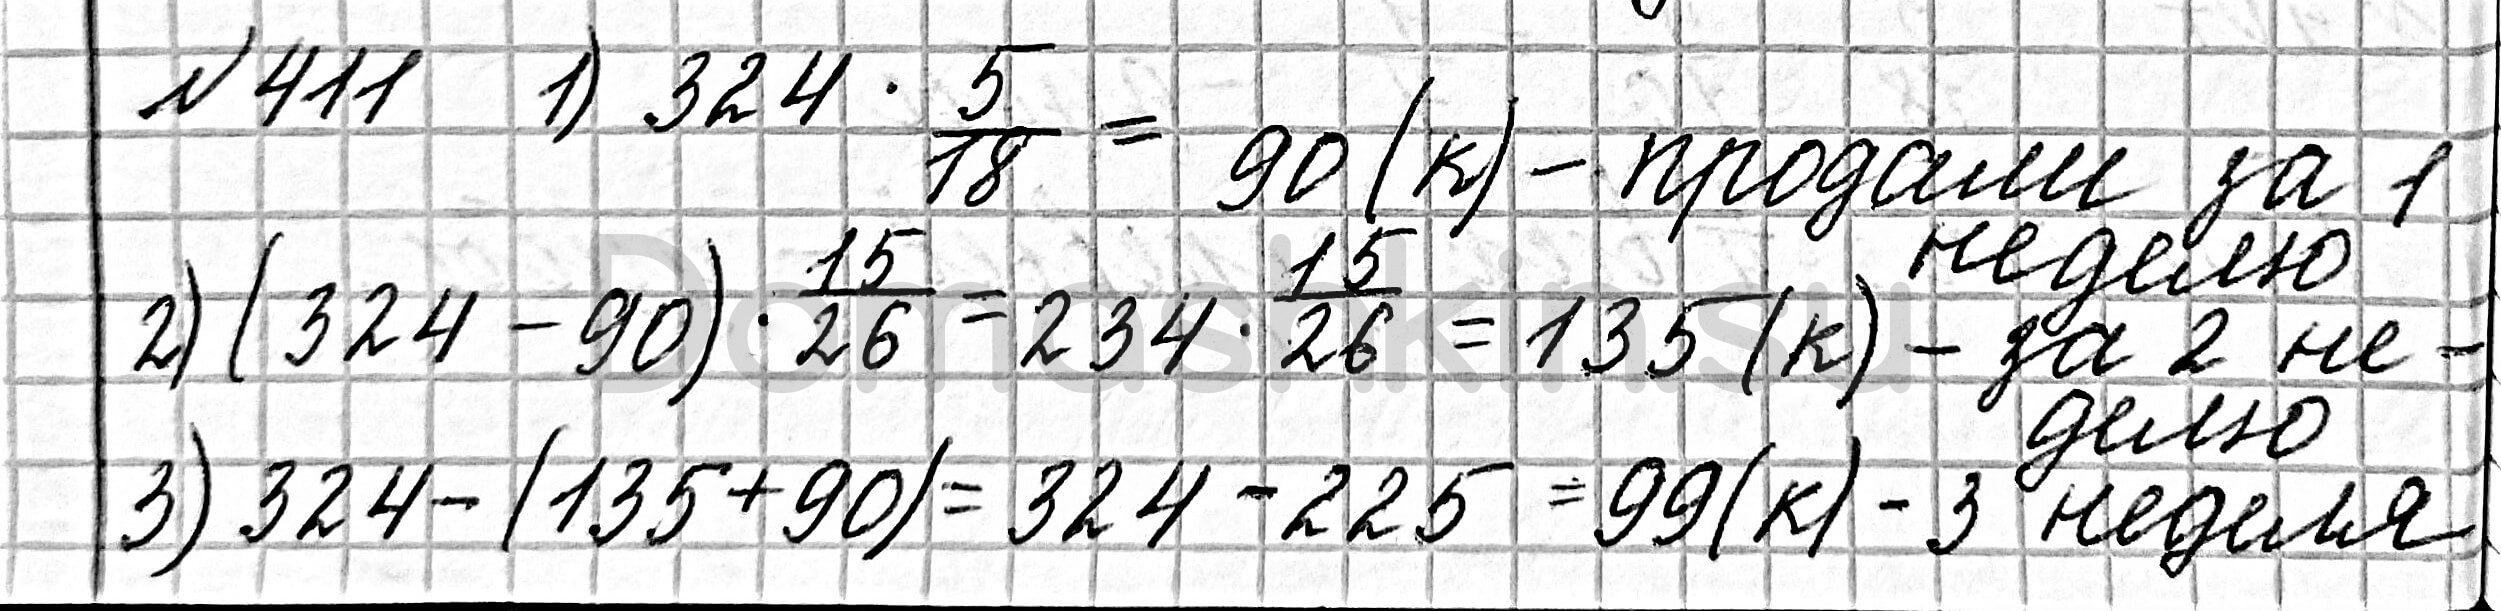 Математика 6 класс учебник Мерзляк номер 411 решение